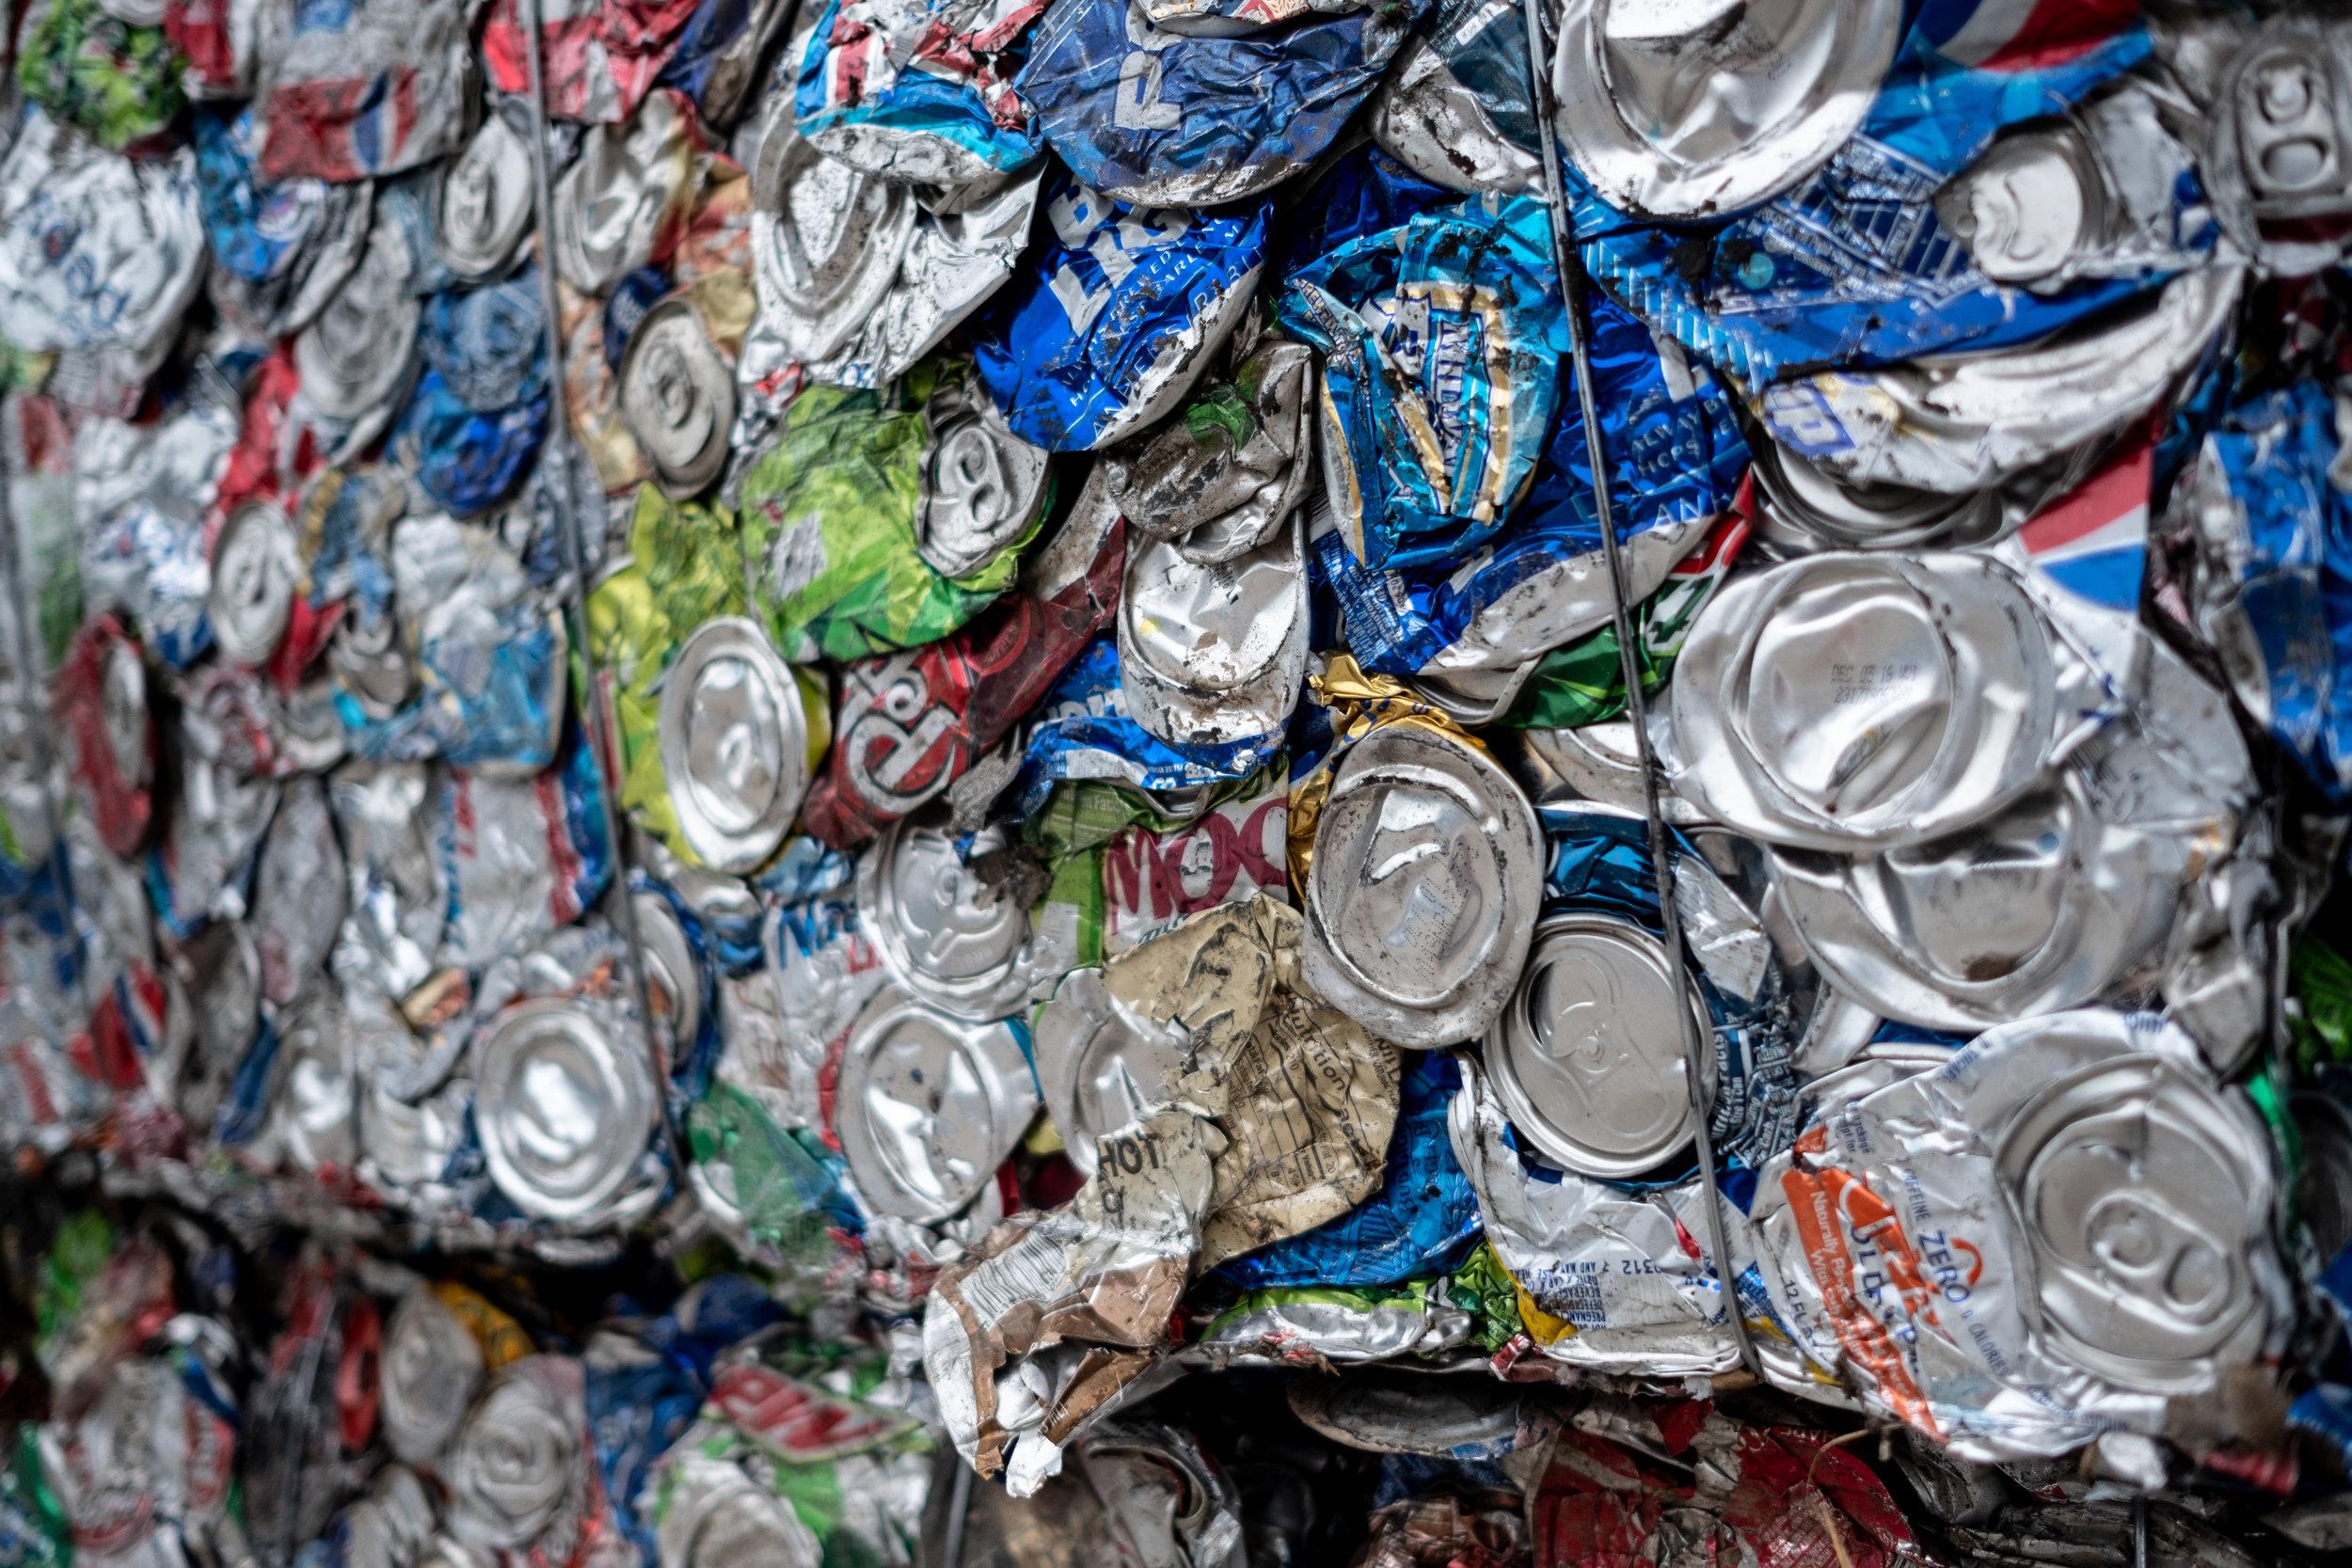 single-peddler-recycling-tips.jpg